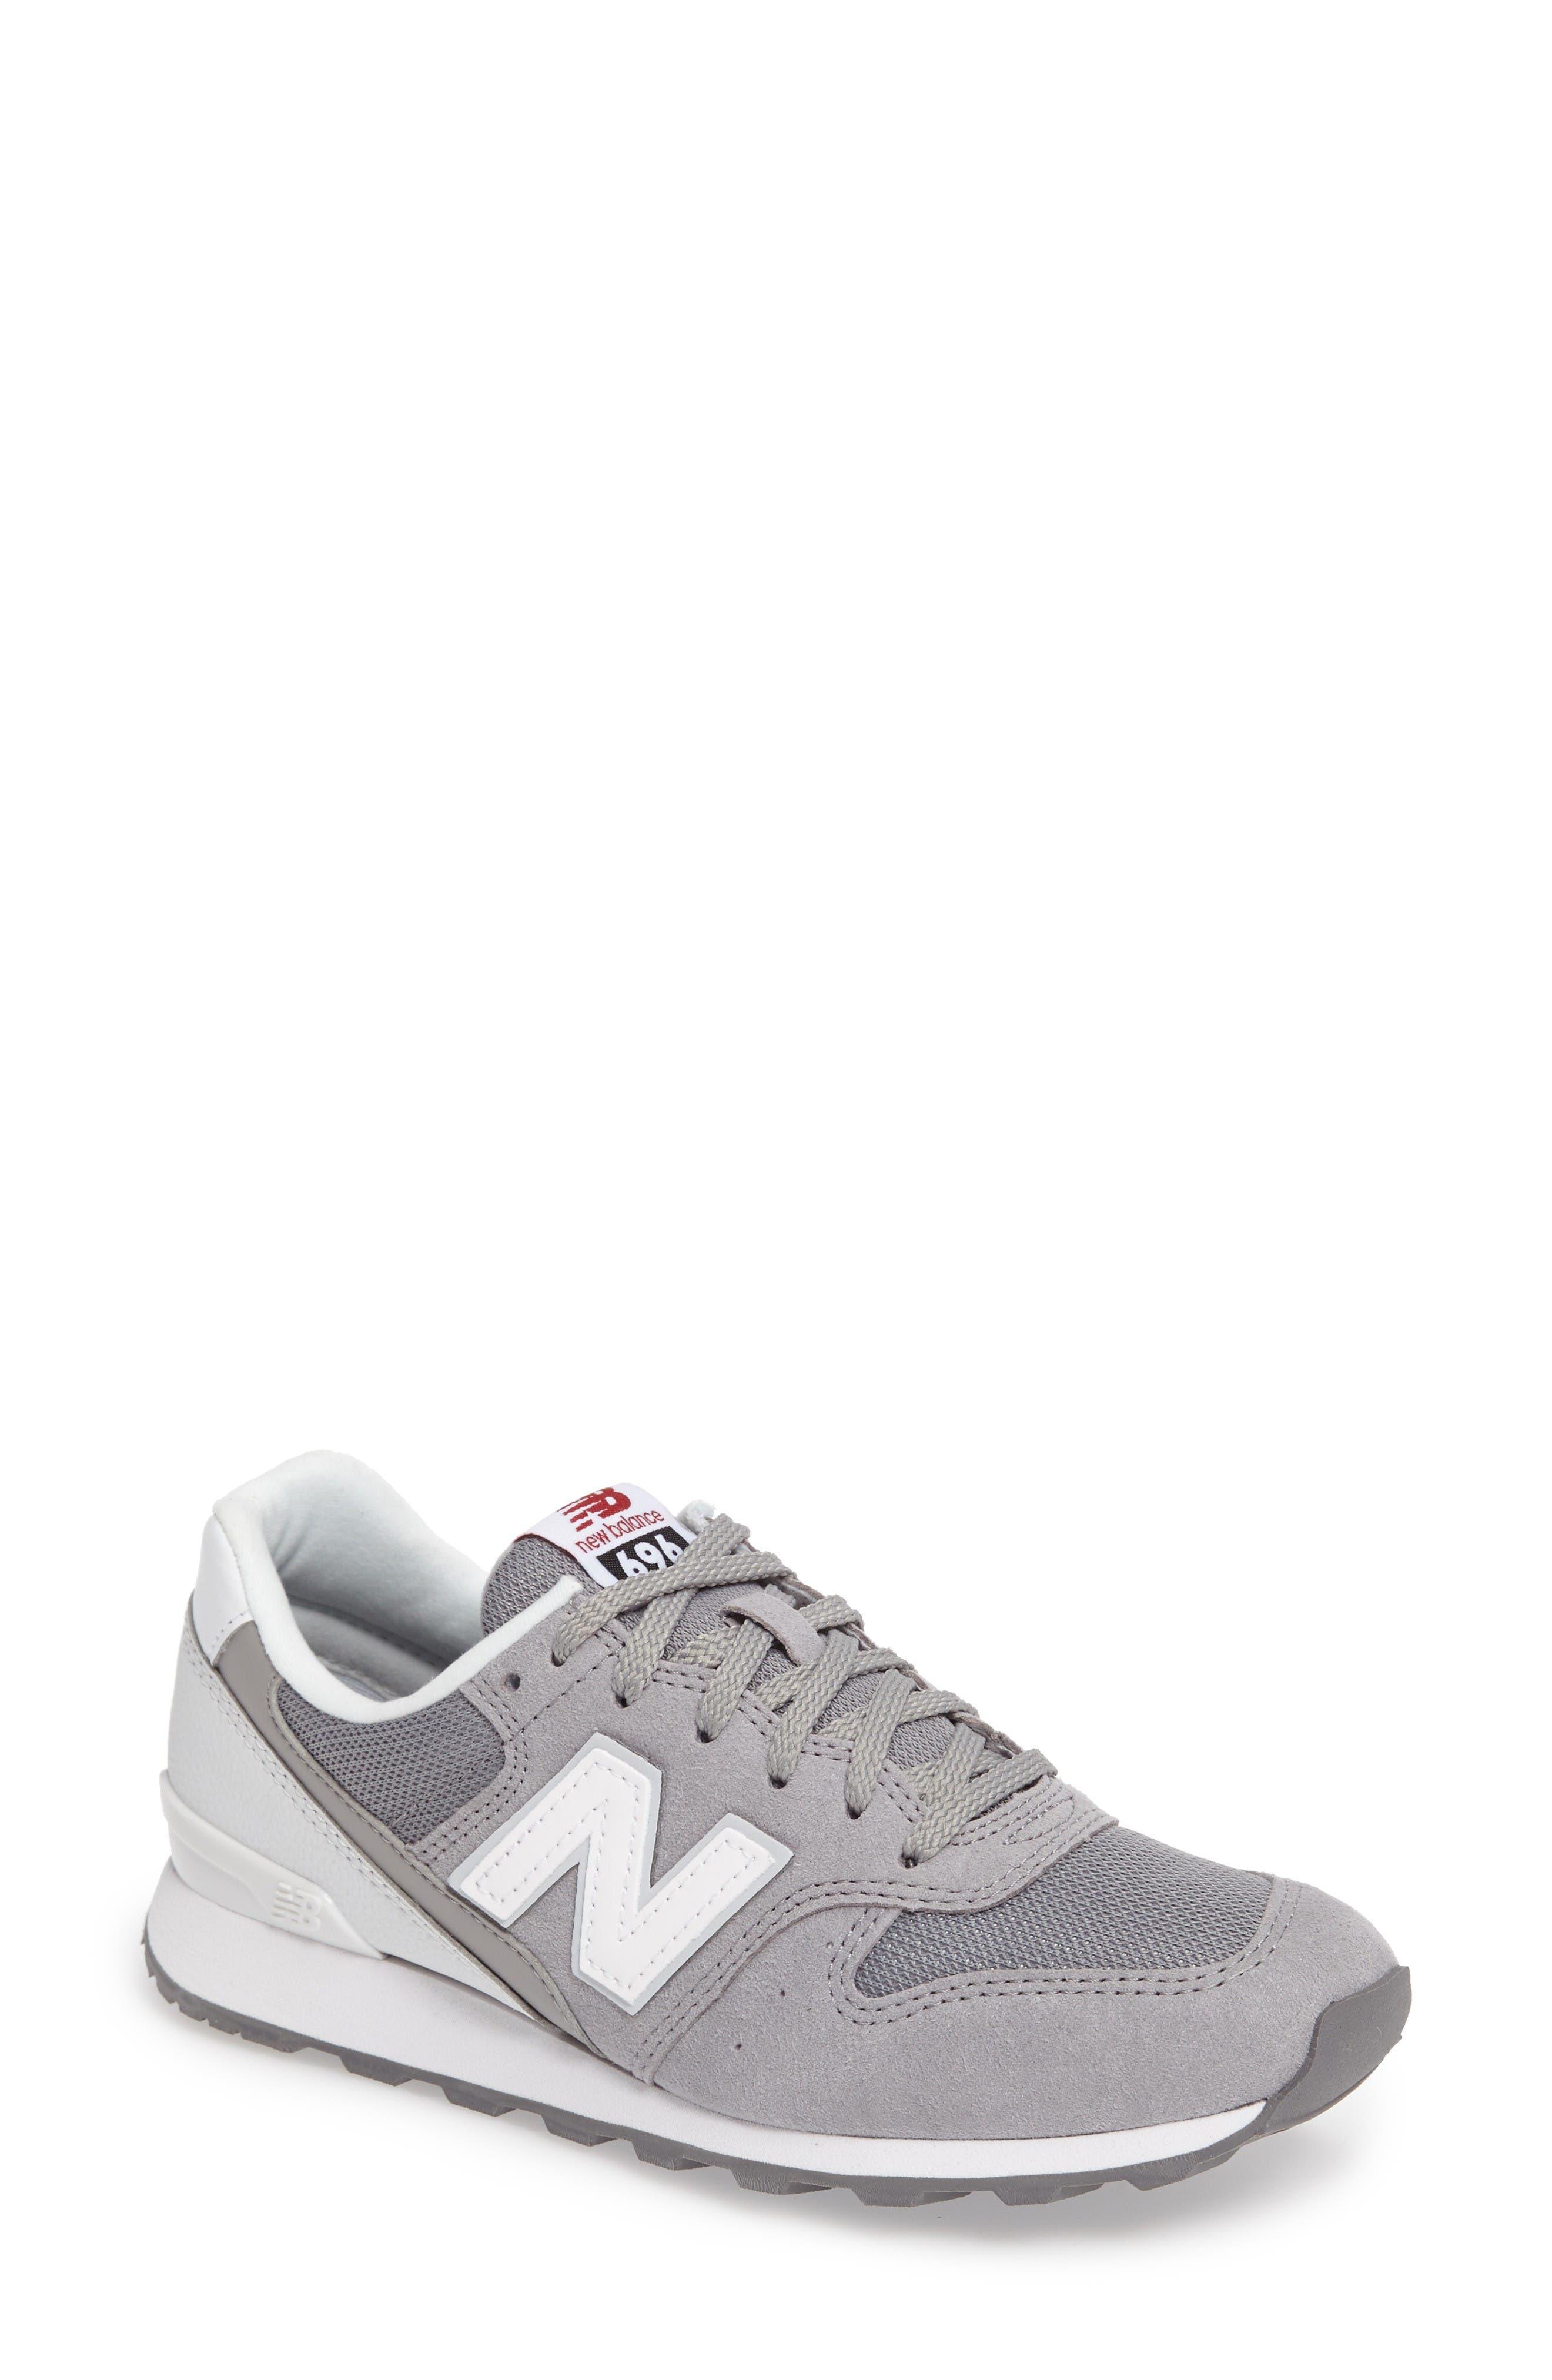 Main Image - New Balance '696' Sneaker (Women)